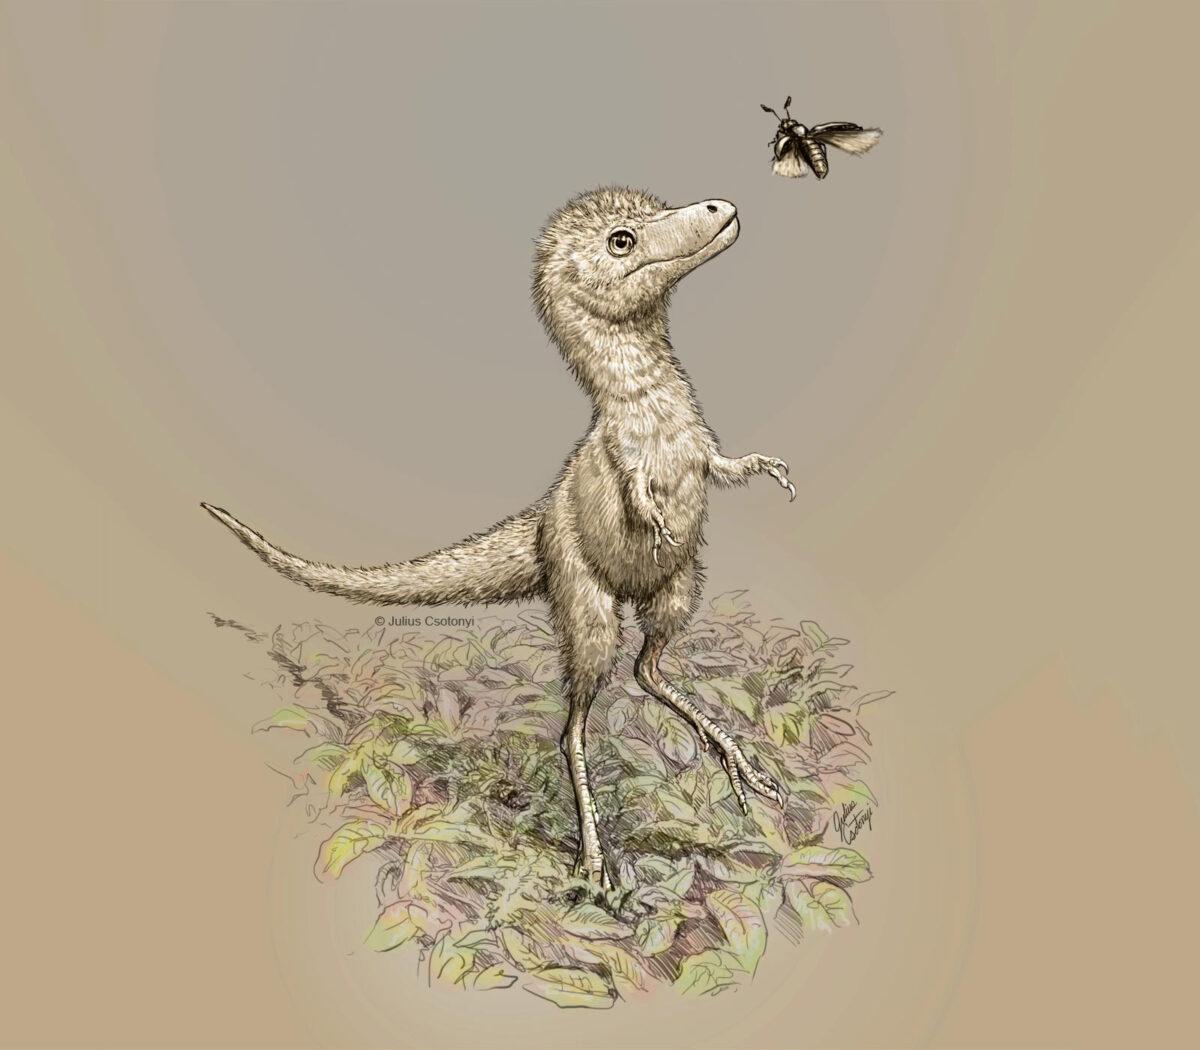 Artist's impression of a juvenile tyrannosaur. Credit: Julius Csotonyi